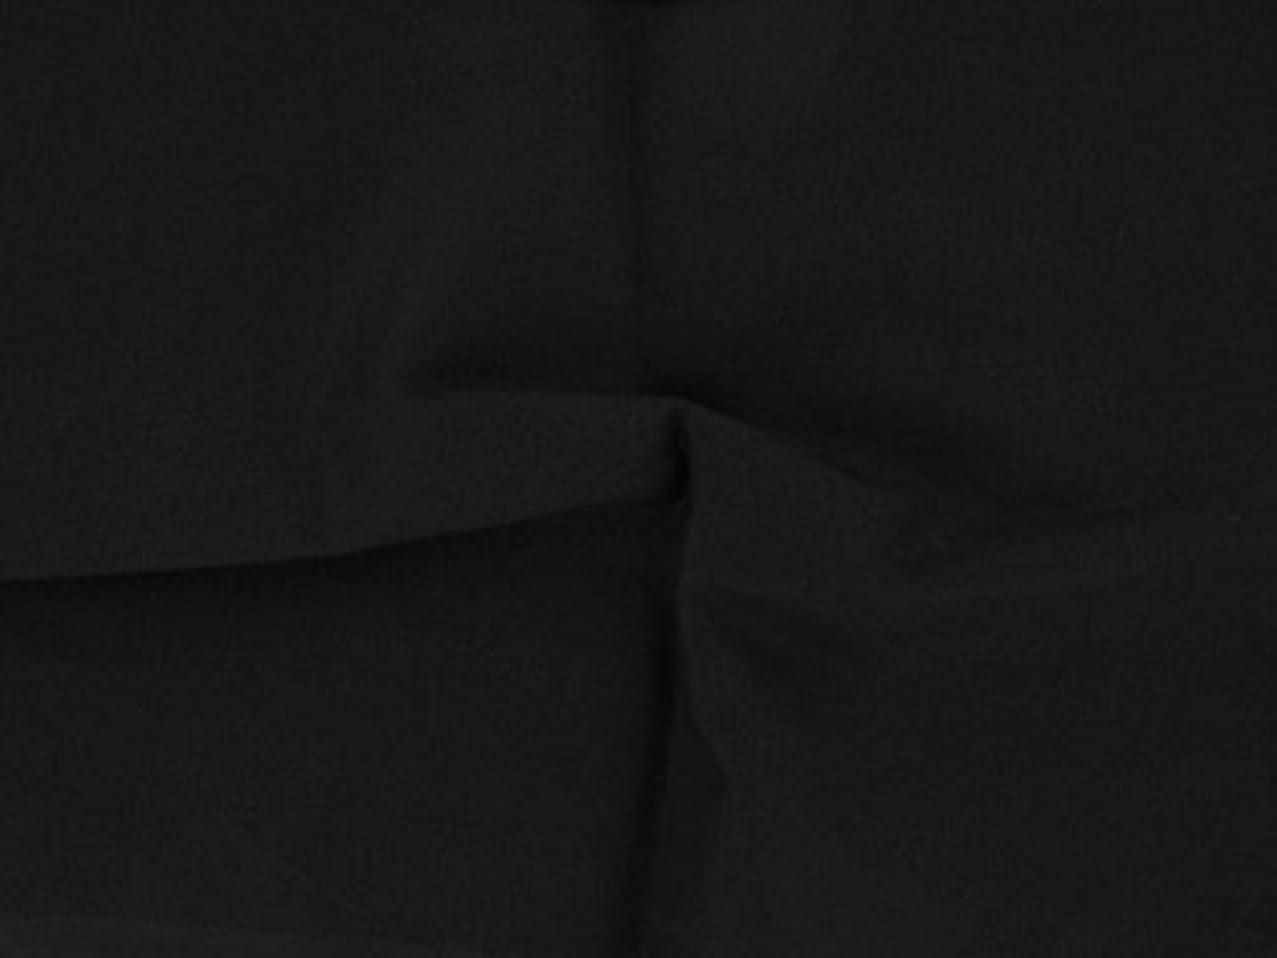 Dalston Mill Fabrics 298-15-L3 Plain Cotton Fabric, Black, 3m